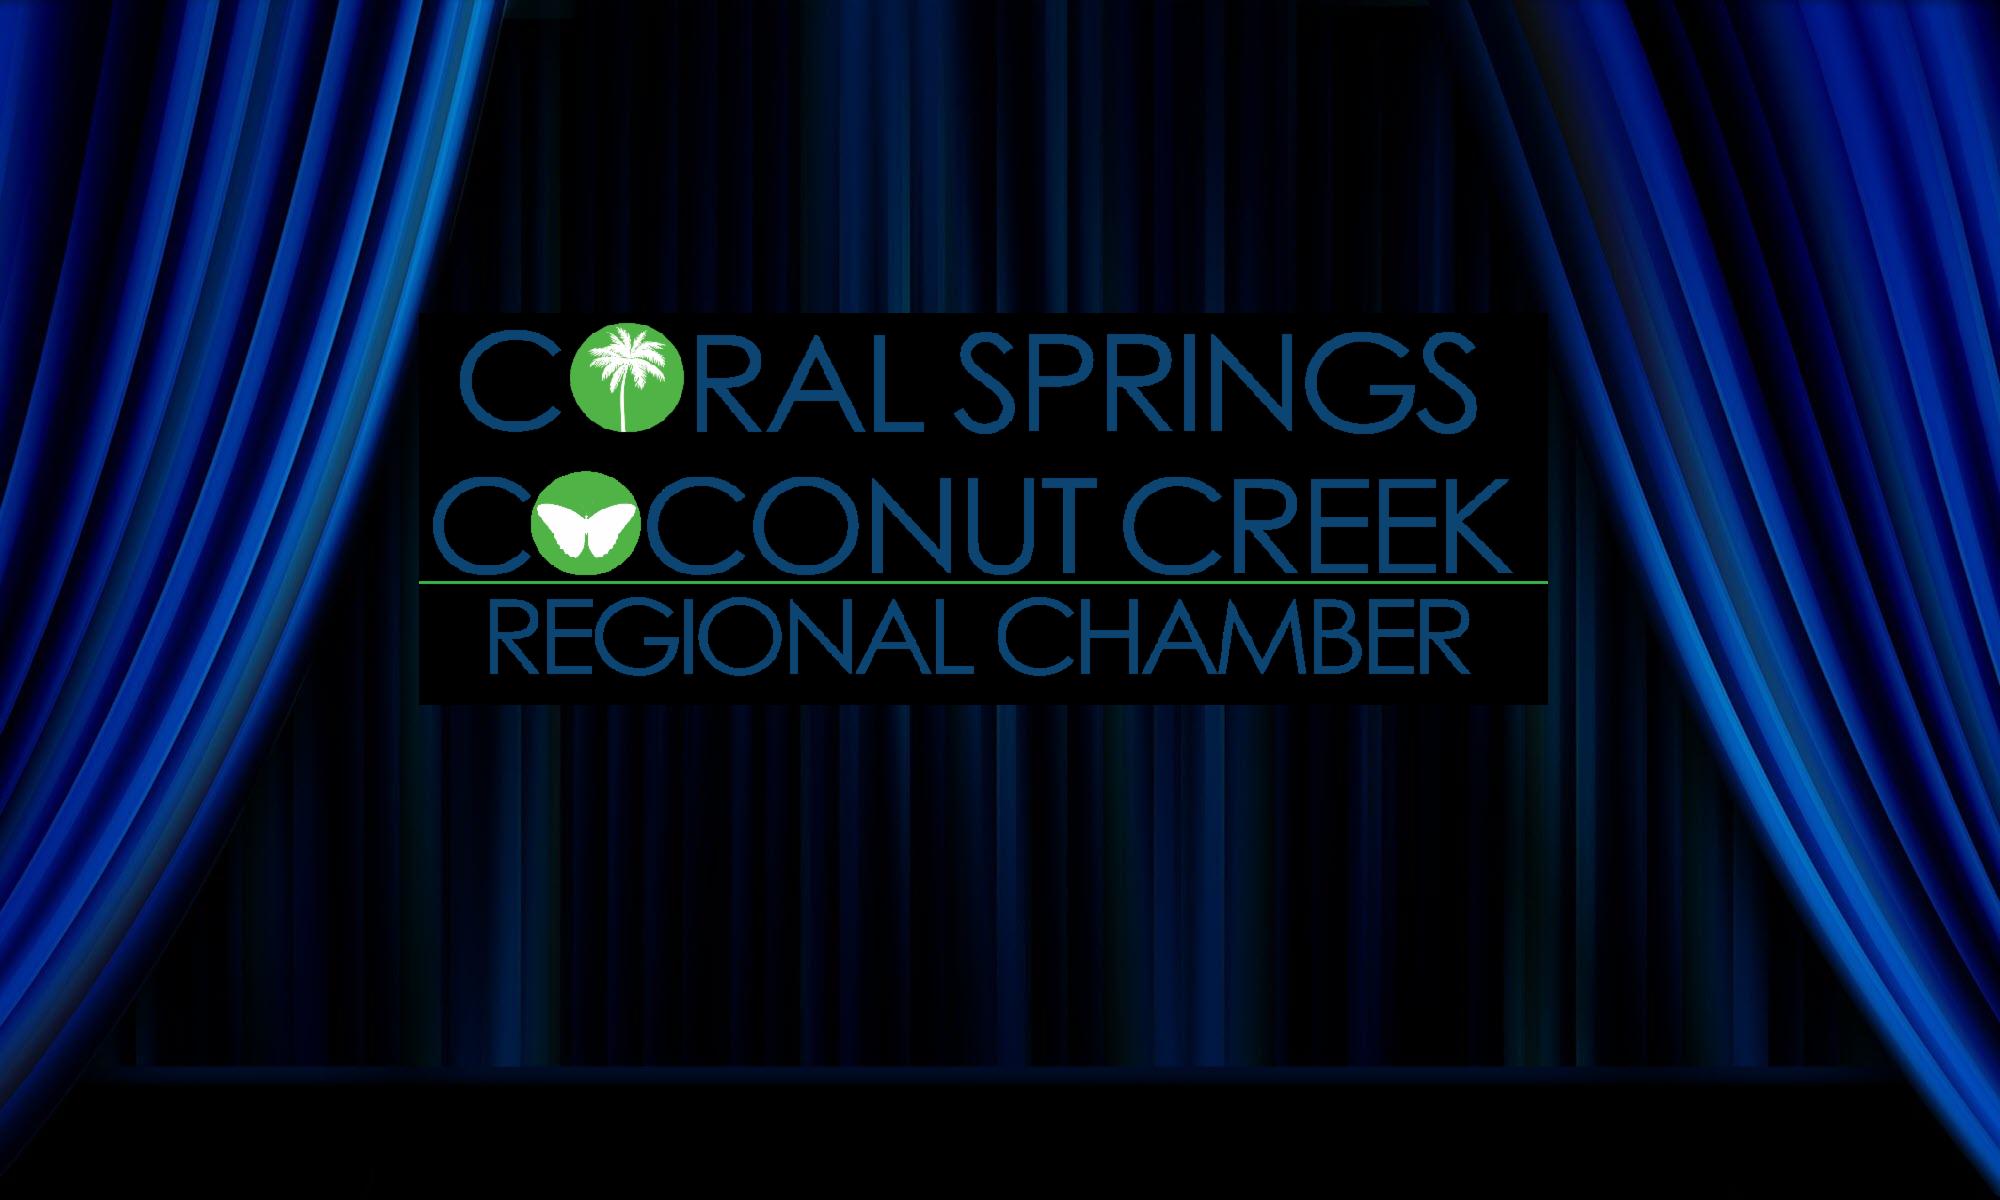 CSCCR Chamber Voices